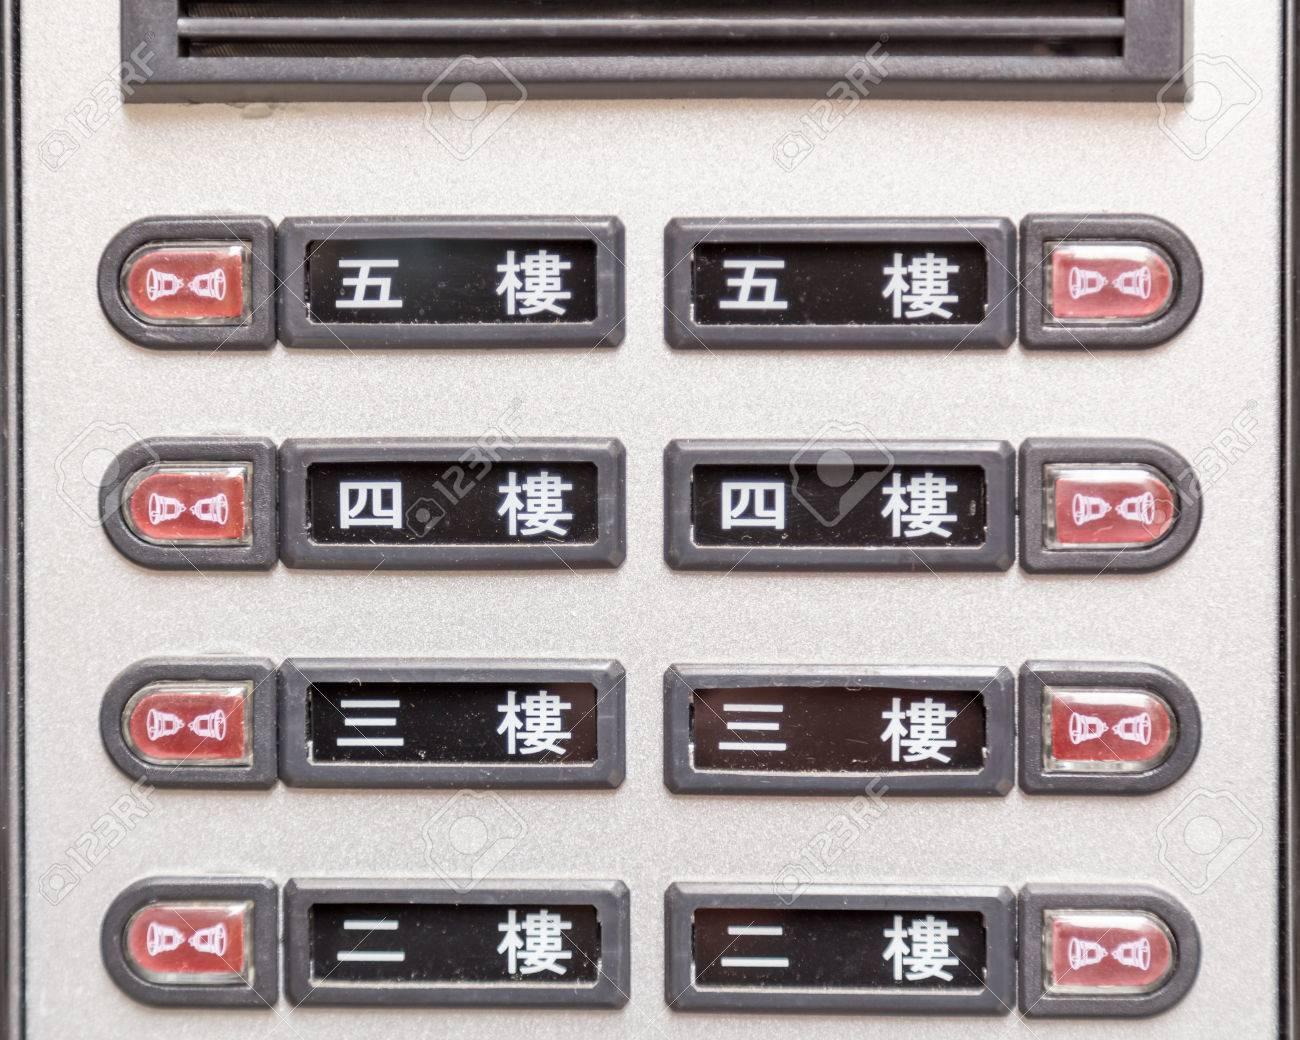 Apartment door buzzer with floors and numbers in Mandarin Chinese Stock Photo - 35601554 & Apartment Door Buzzer With Floors And Numbers In Mandarin Chinese ...